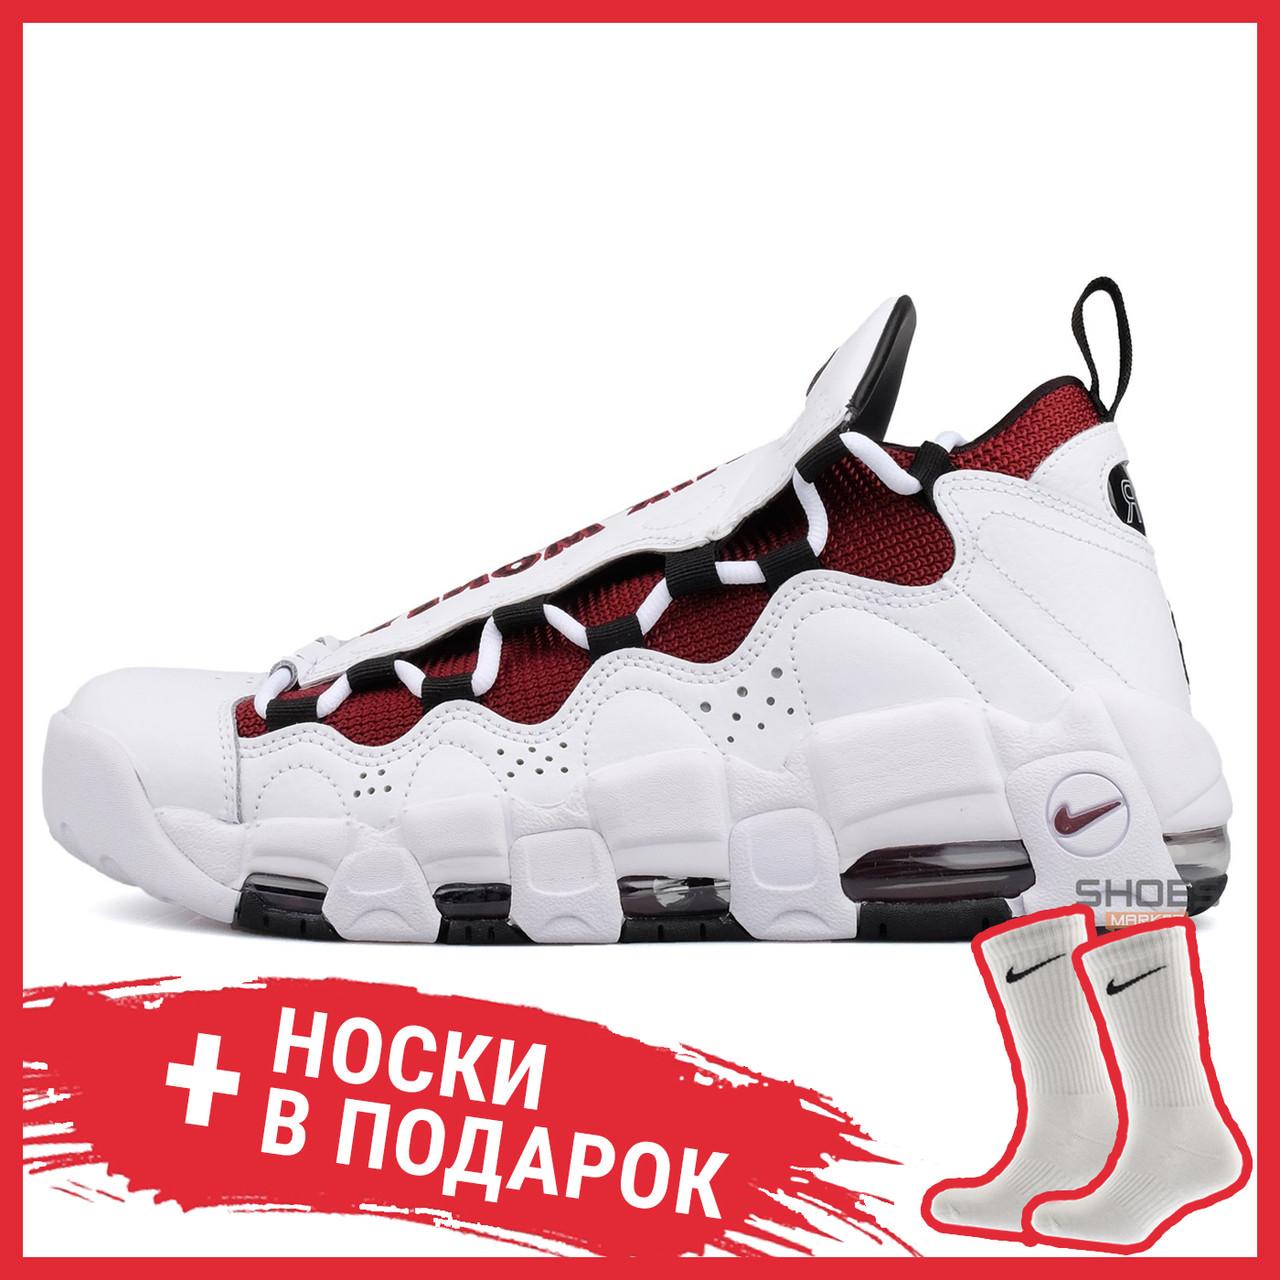 Мужские кроссовки Nike Air More Money White/Black - Team Red aj2998 100, Найк Аир Мор